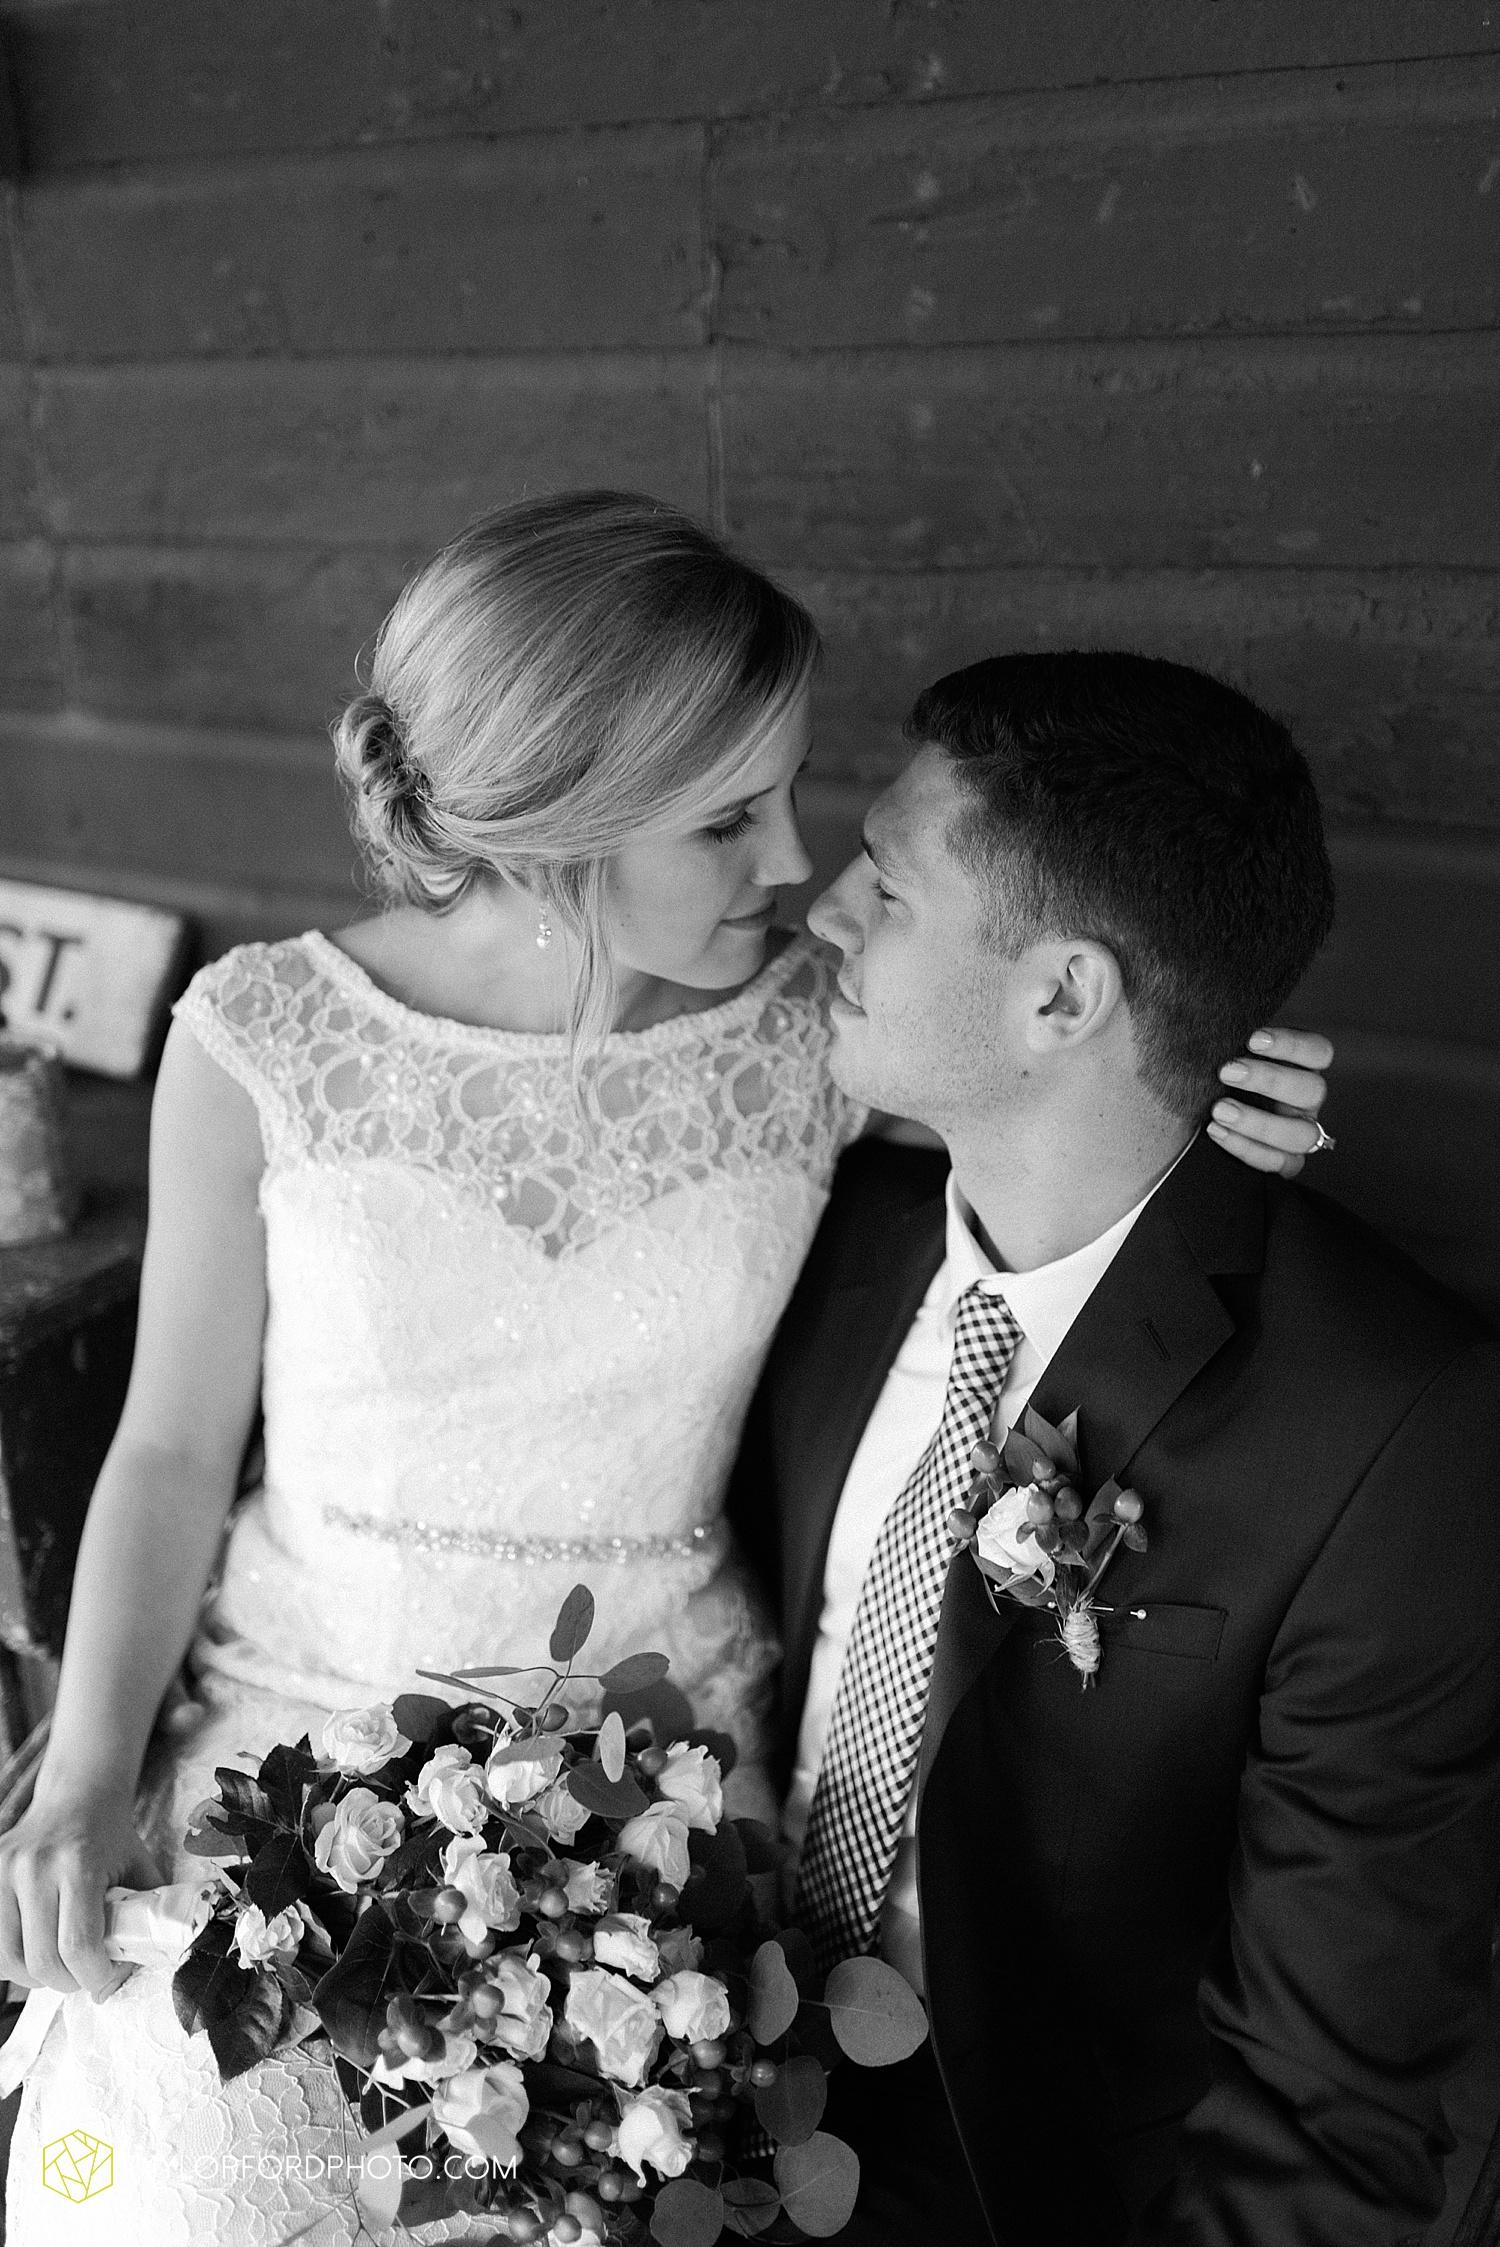 fort_wayne_indiana_van_wert_columbus_ohio_nashville_tennessee_photographer_taylor_ford_shoppes_at_old_mill_wedding_0717.jpg